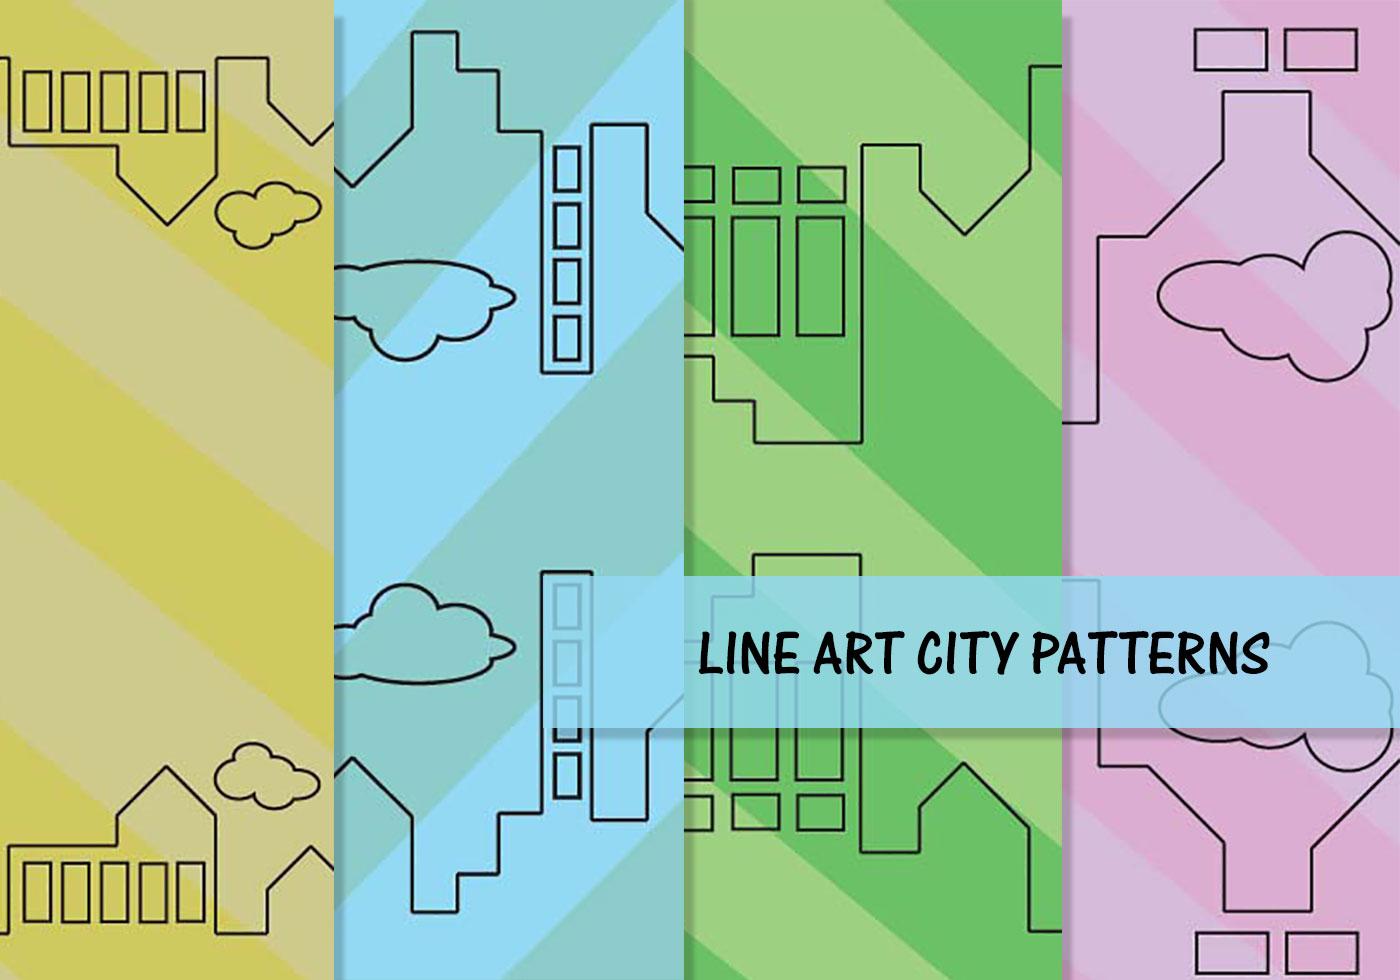 Line Art City : Line art city pattern